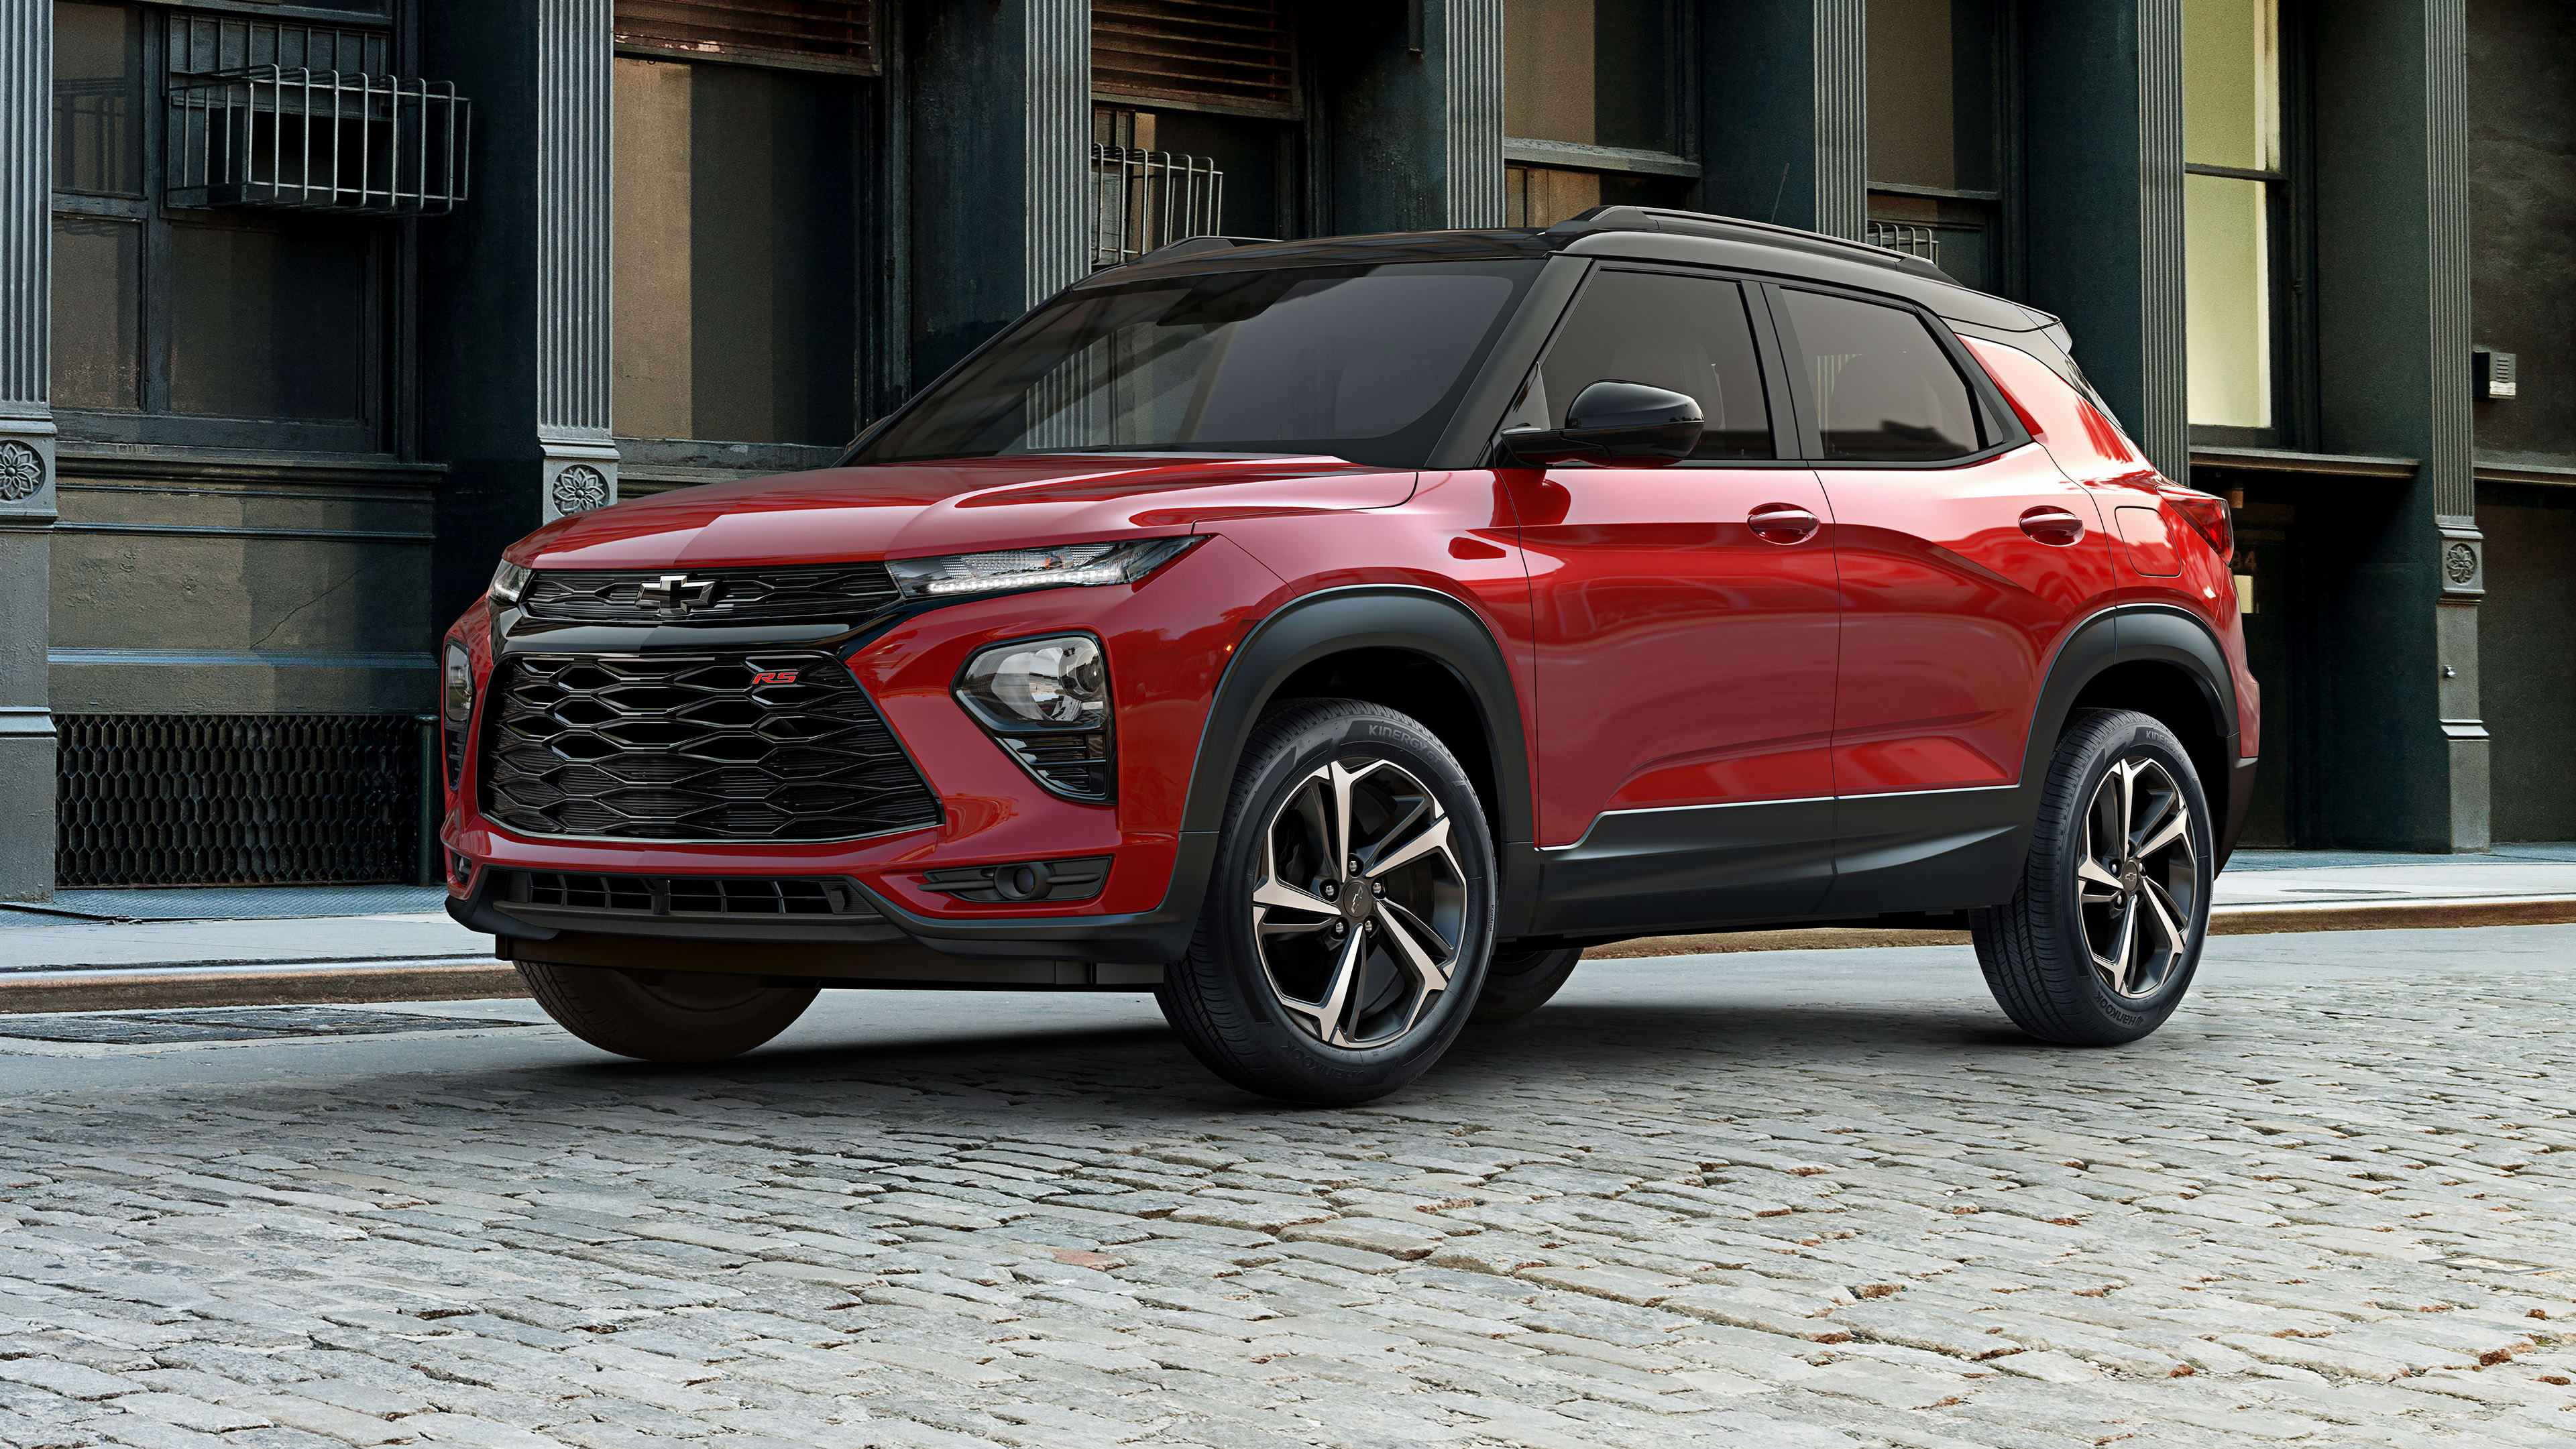 New Blazer SUV Inspires 2020 Chevy Trax >> 2020 Chevrolet Trailblazer Sub Equinox Suv Revealed Caradvice